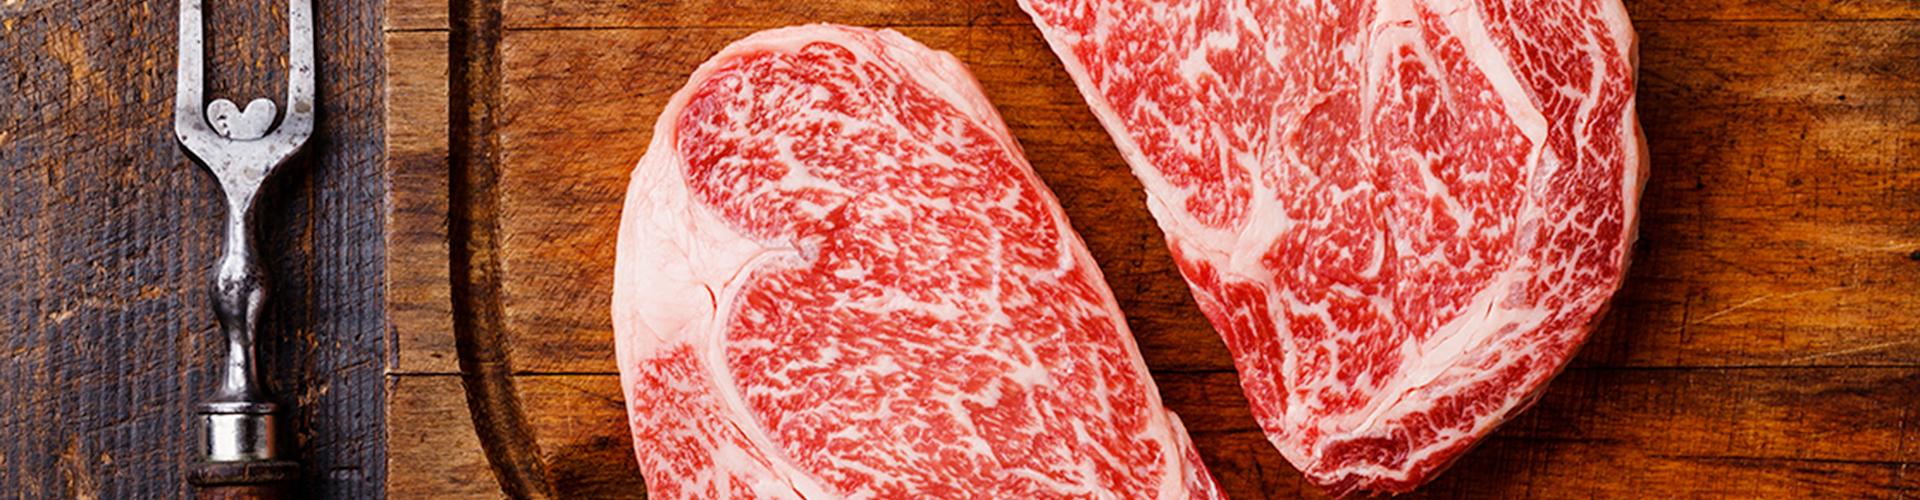 Meat Slide